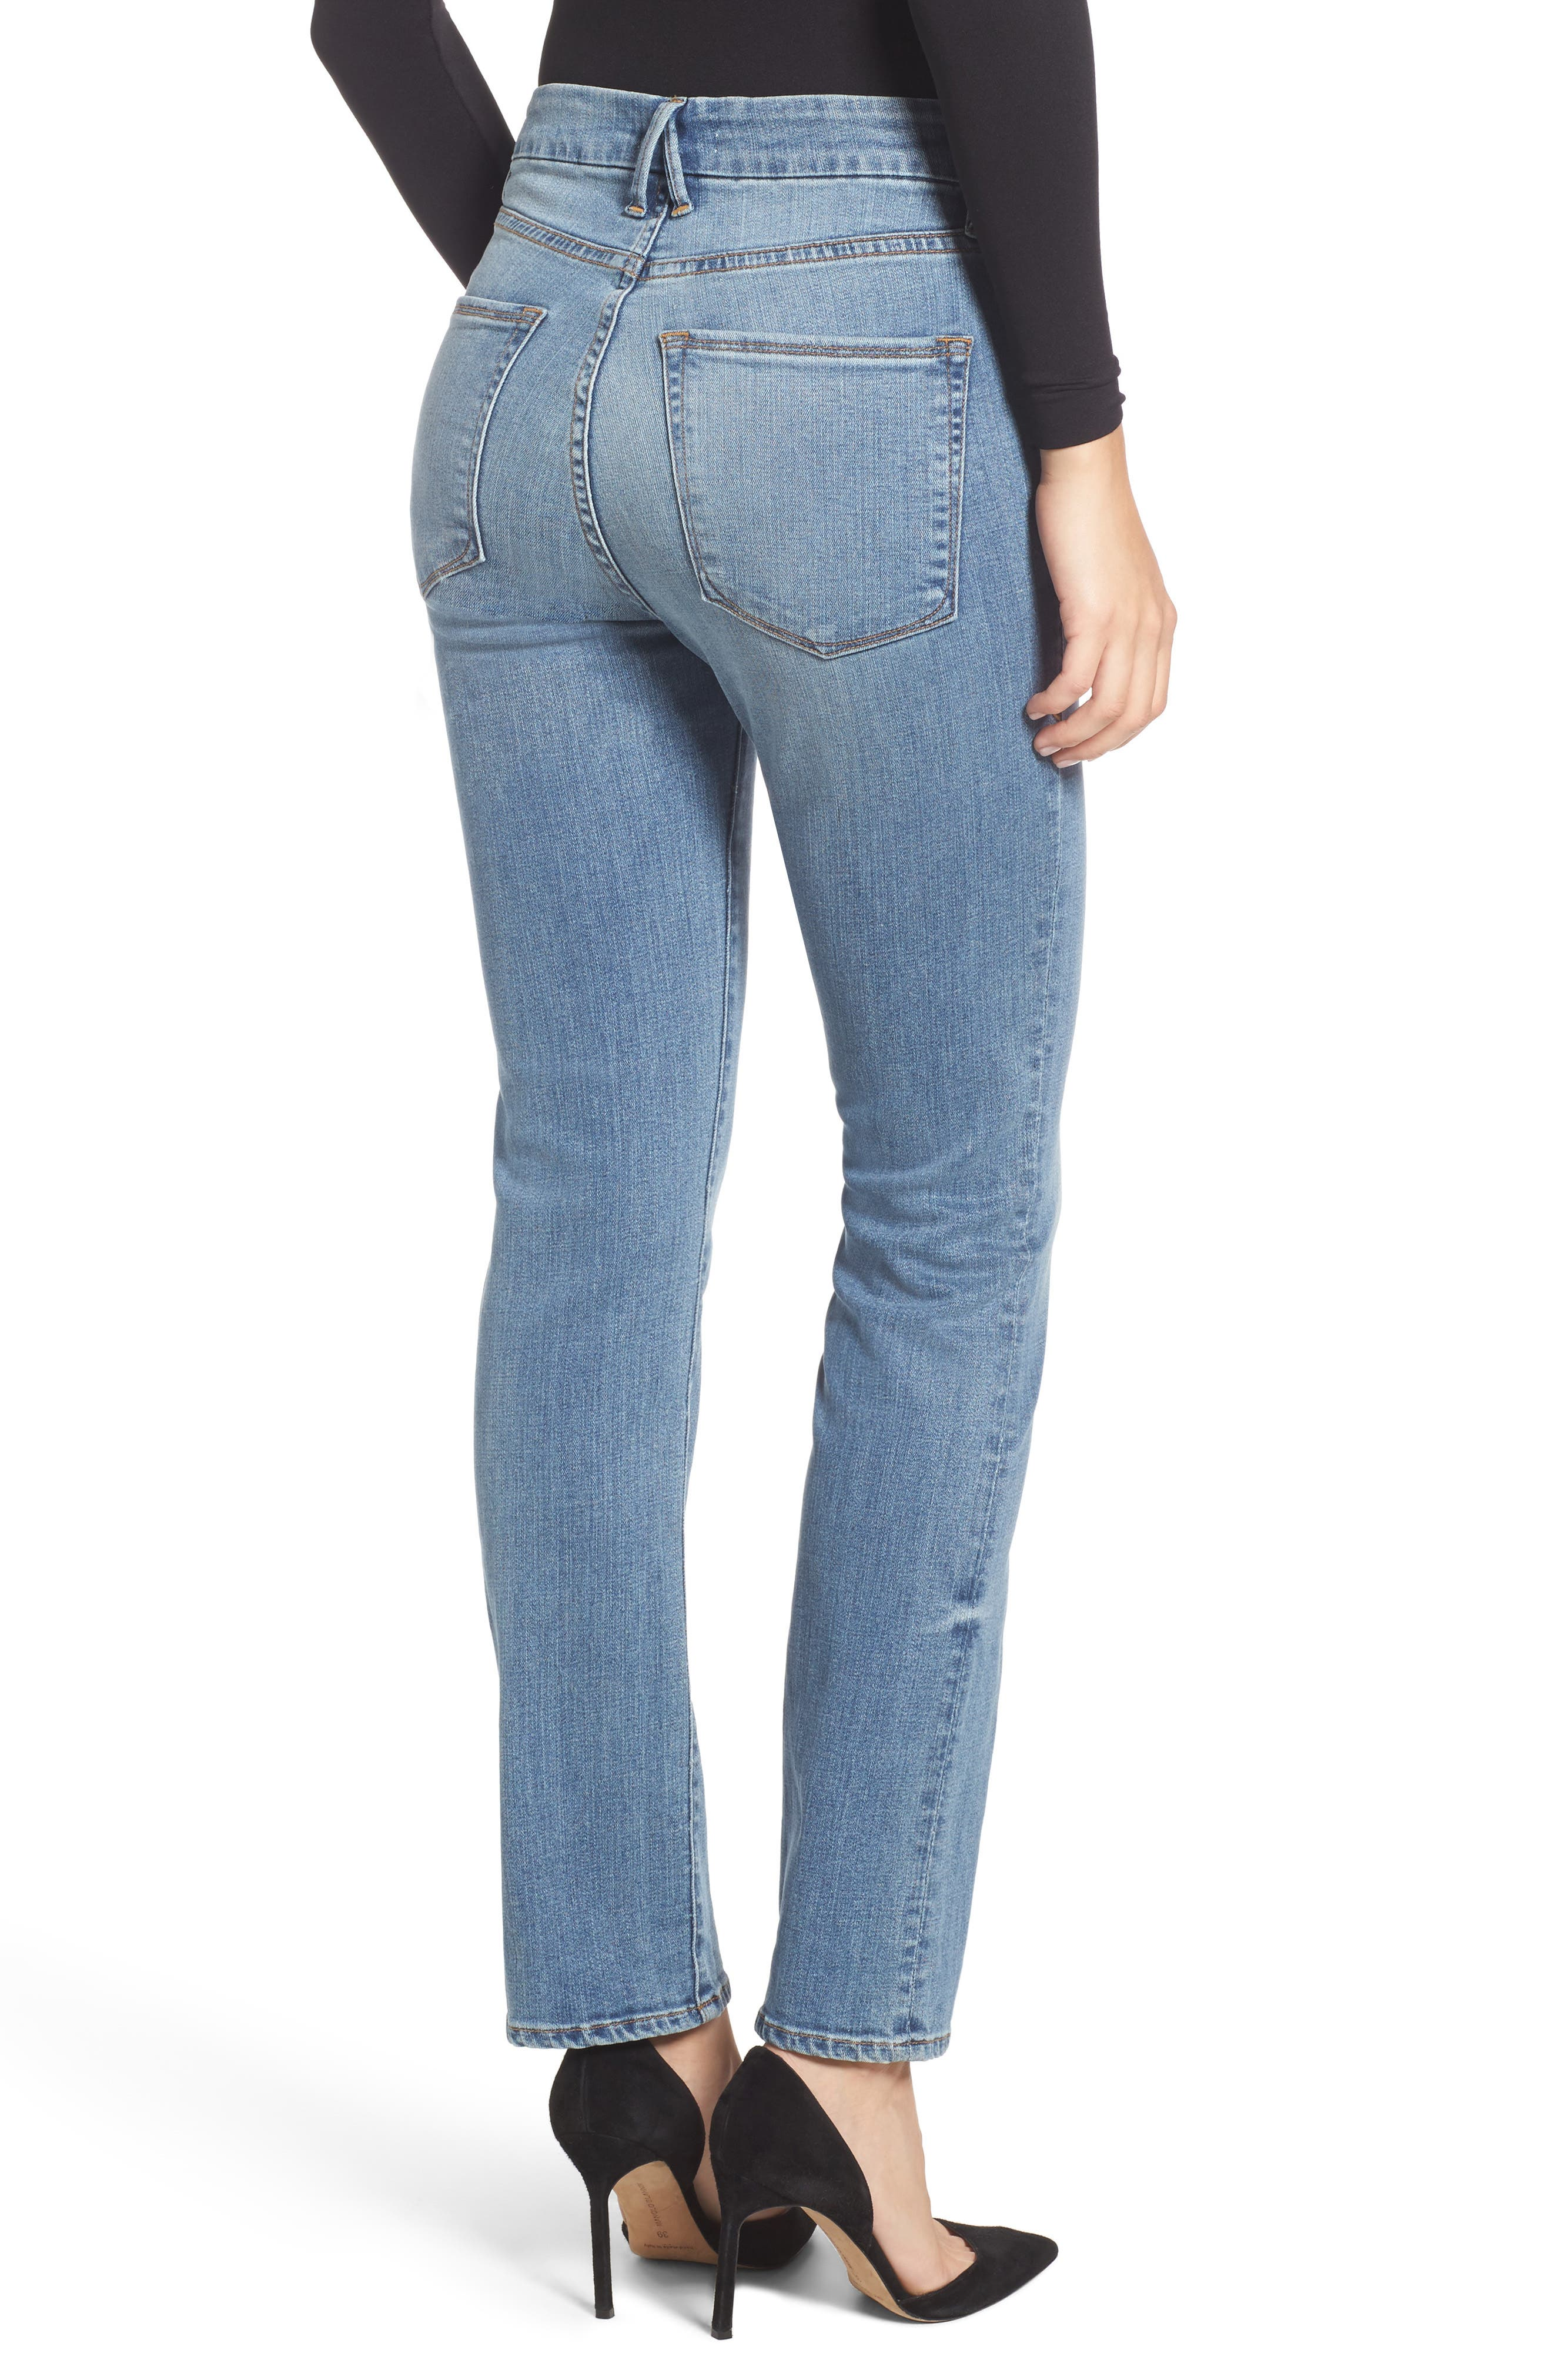 Alternate Image 3  - Good American Good Straight High Rise Jeans (Blue 087) (Regular & Plus Size)